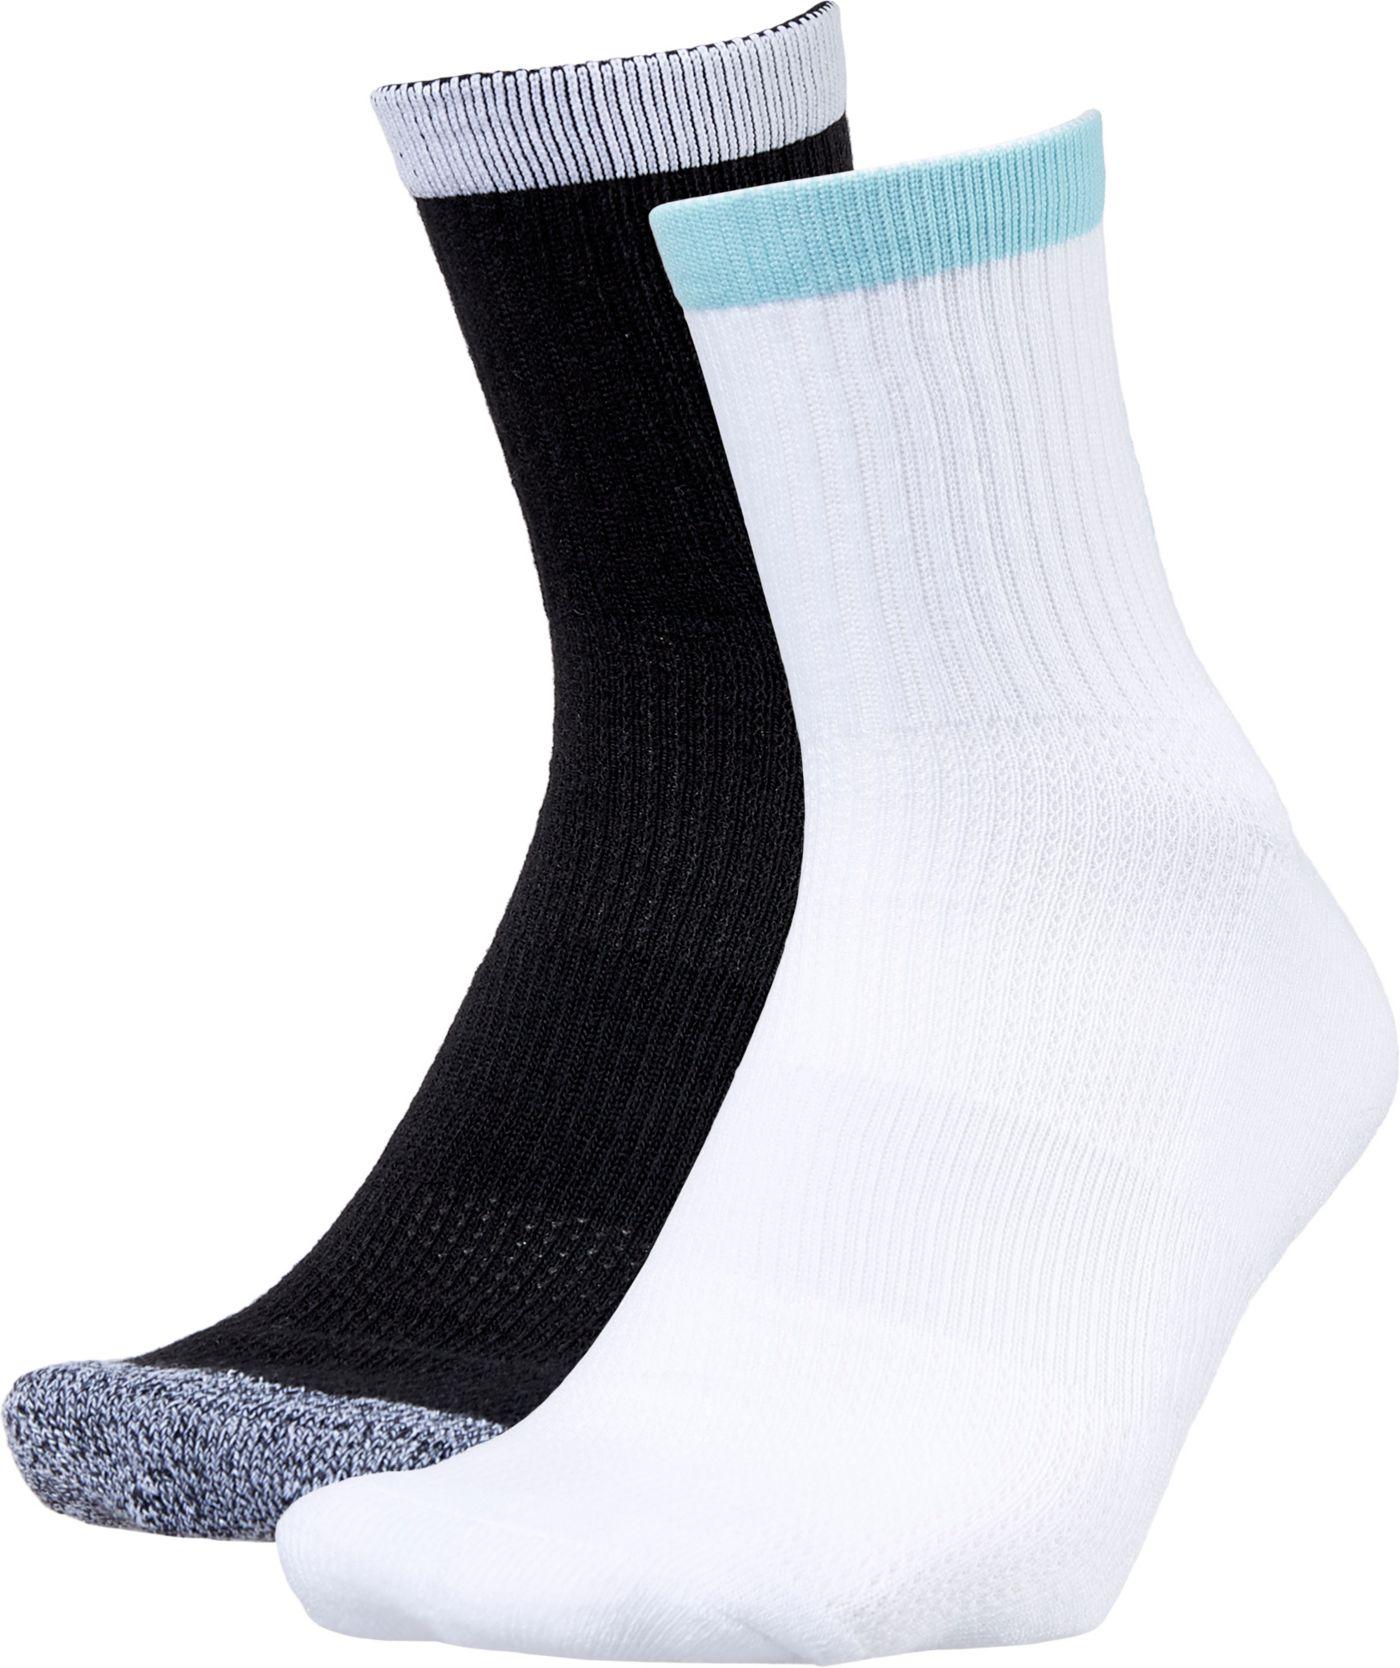 Prince Men's Half-Crew Tennis Socks 2 Pack